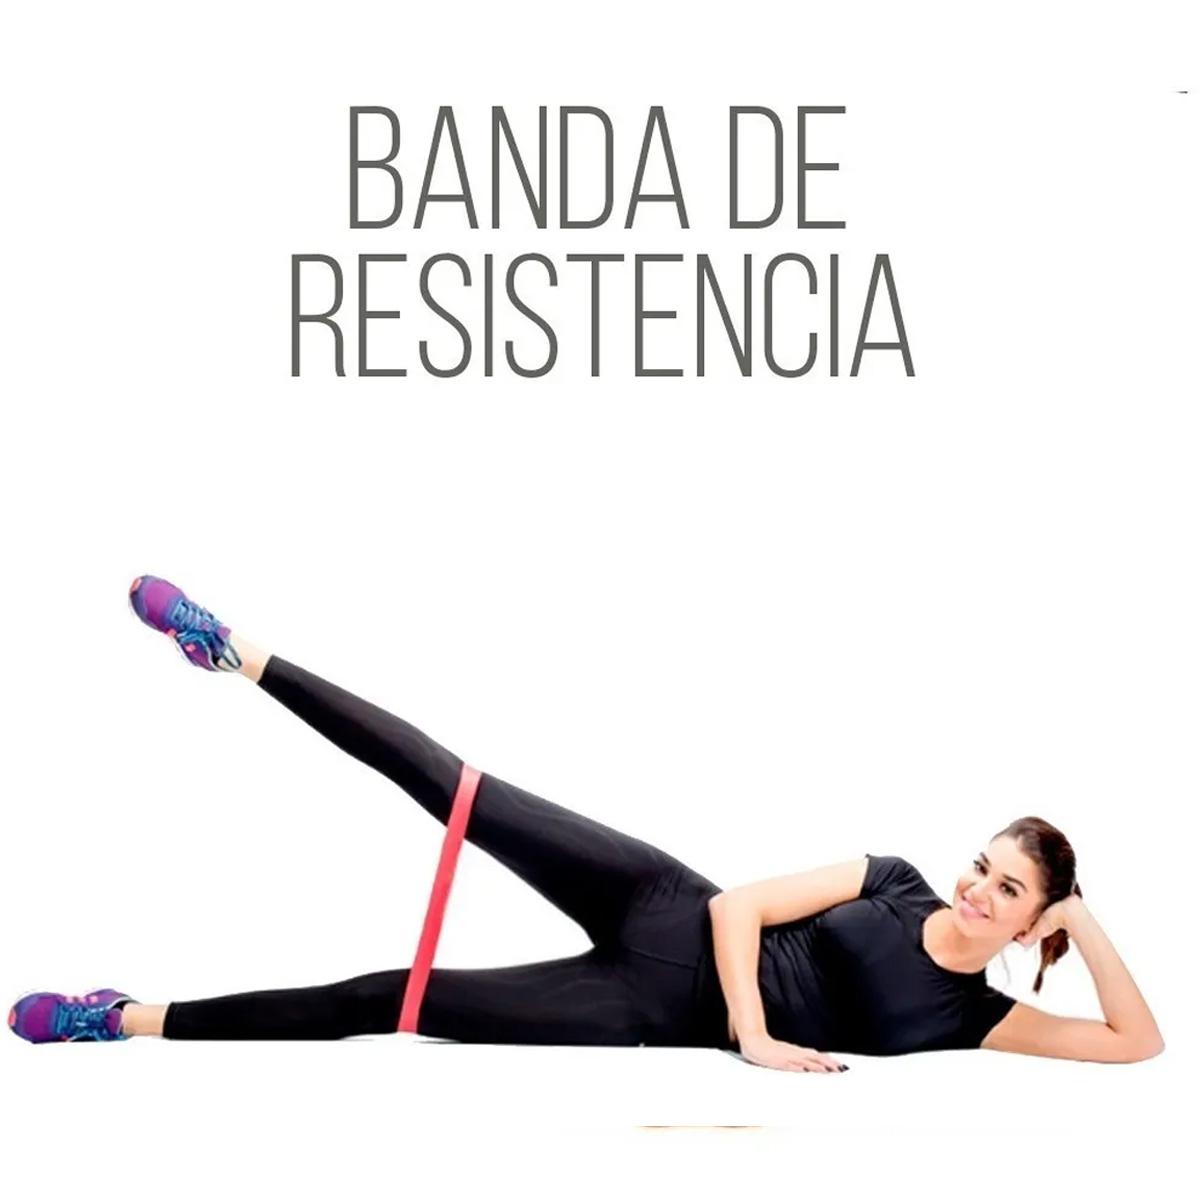 Set 5 Bandas De Resistencia Ligas Para Ejercicio Yoga Fisioterapia